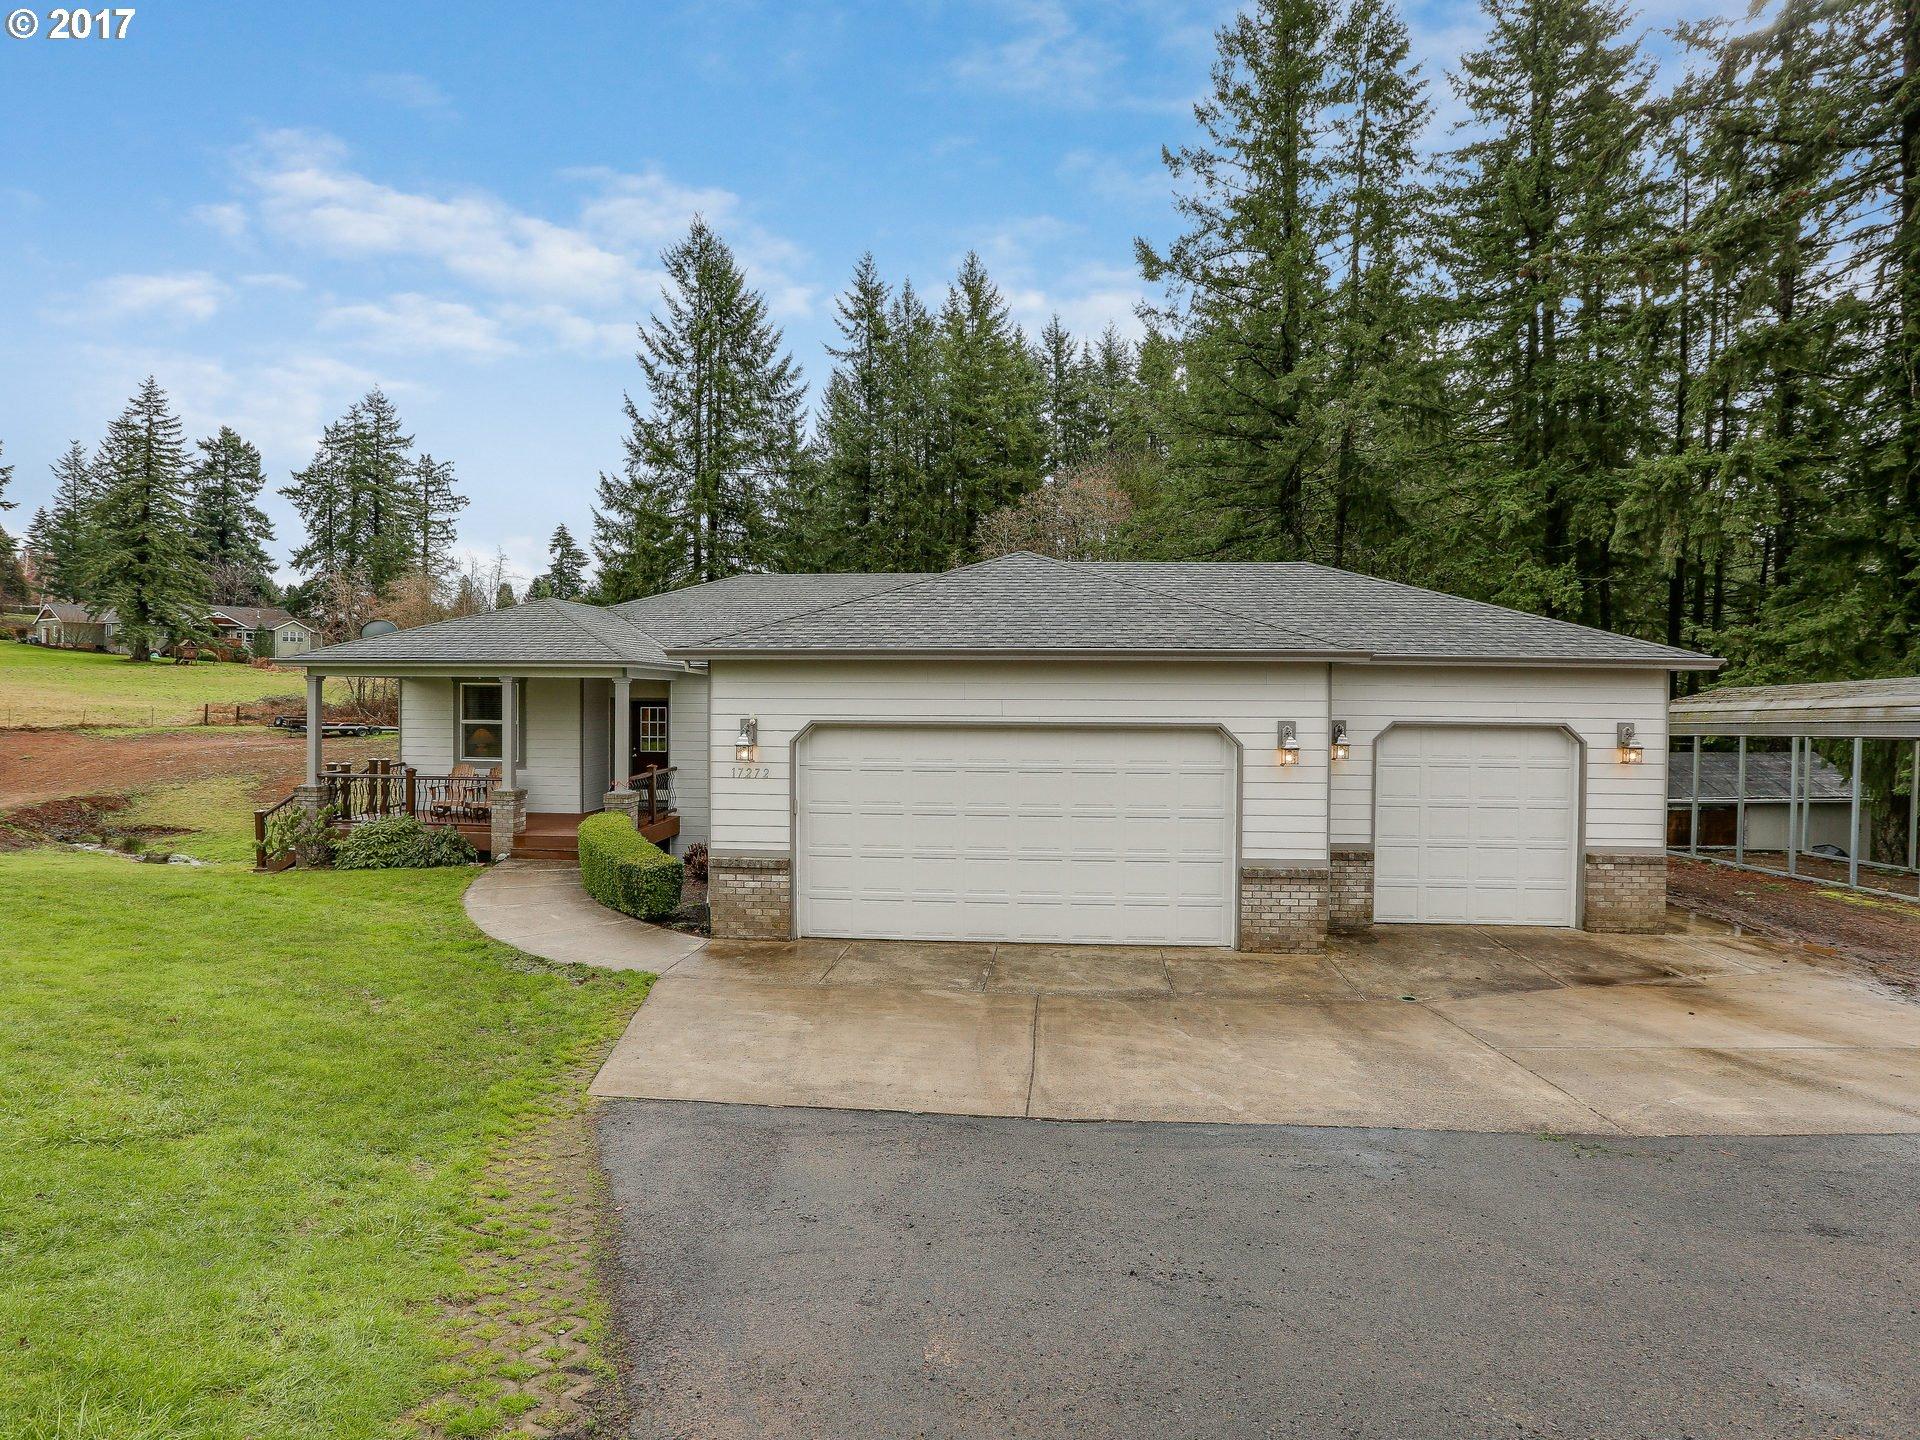 17272 S BECKMAN RD, Oregon City, OR 97045